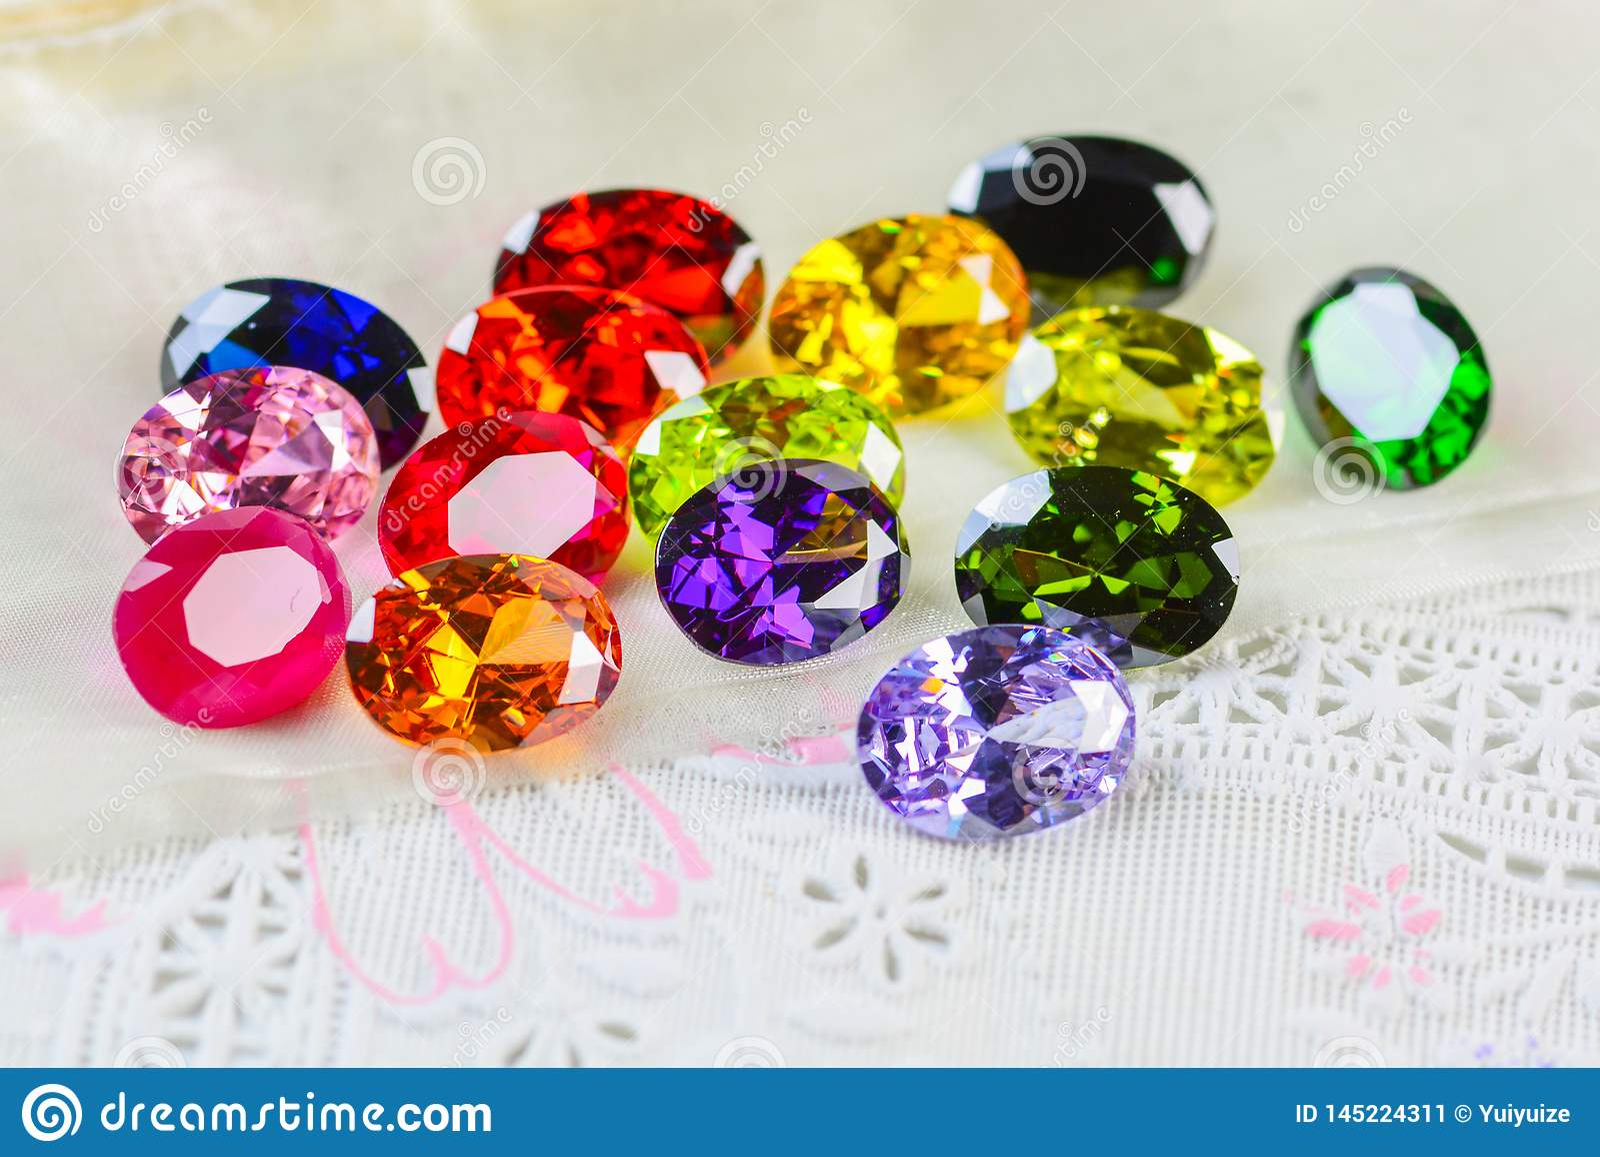 Cubic zirconia gemstones